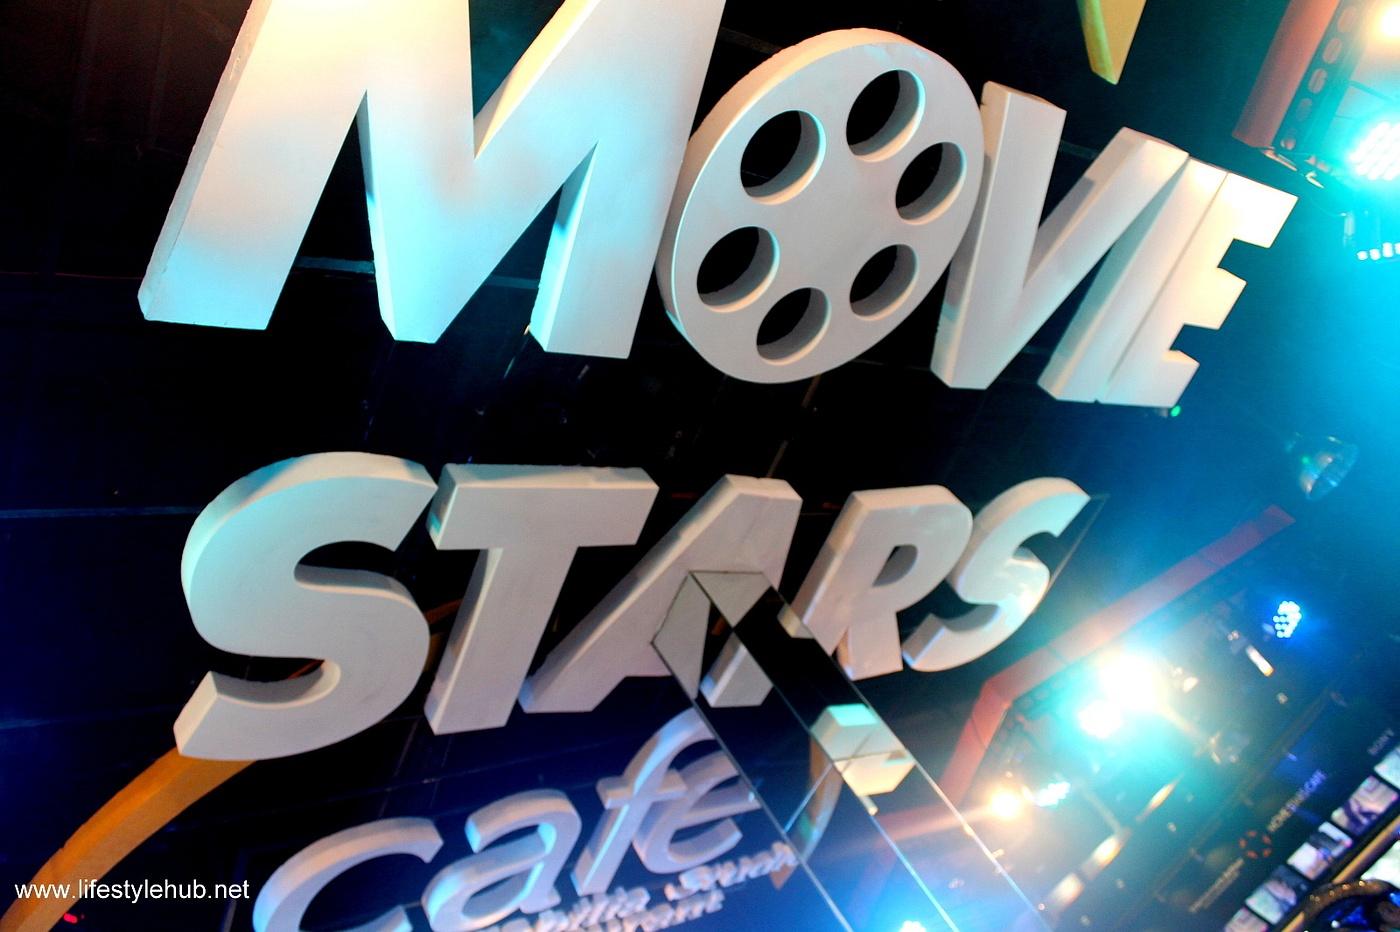 GMANewsTV Day off Bela Padilla